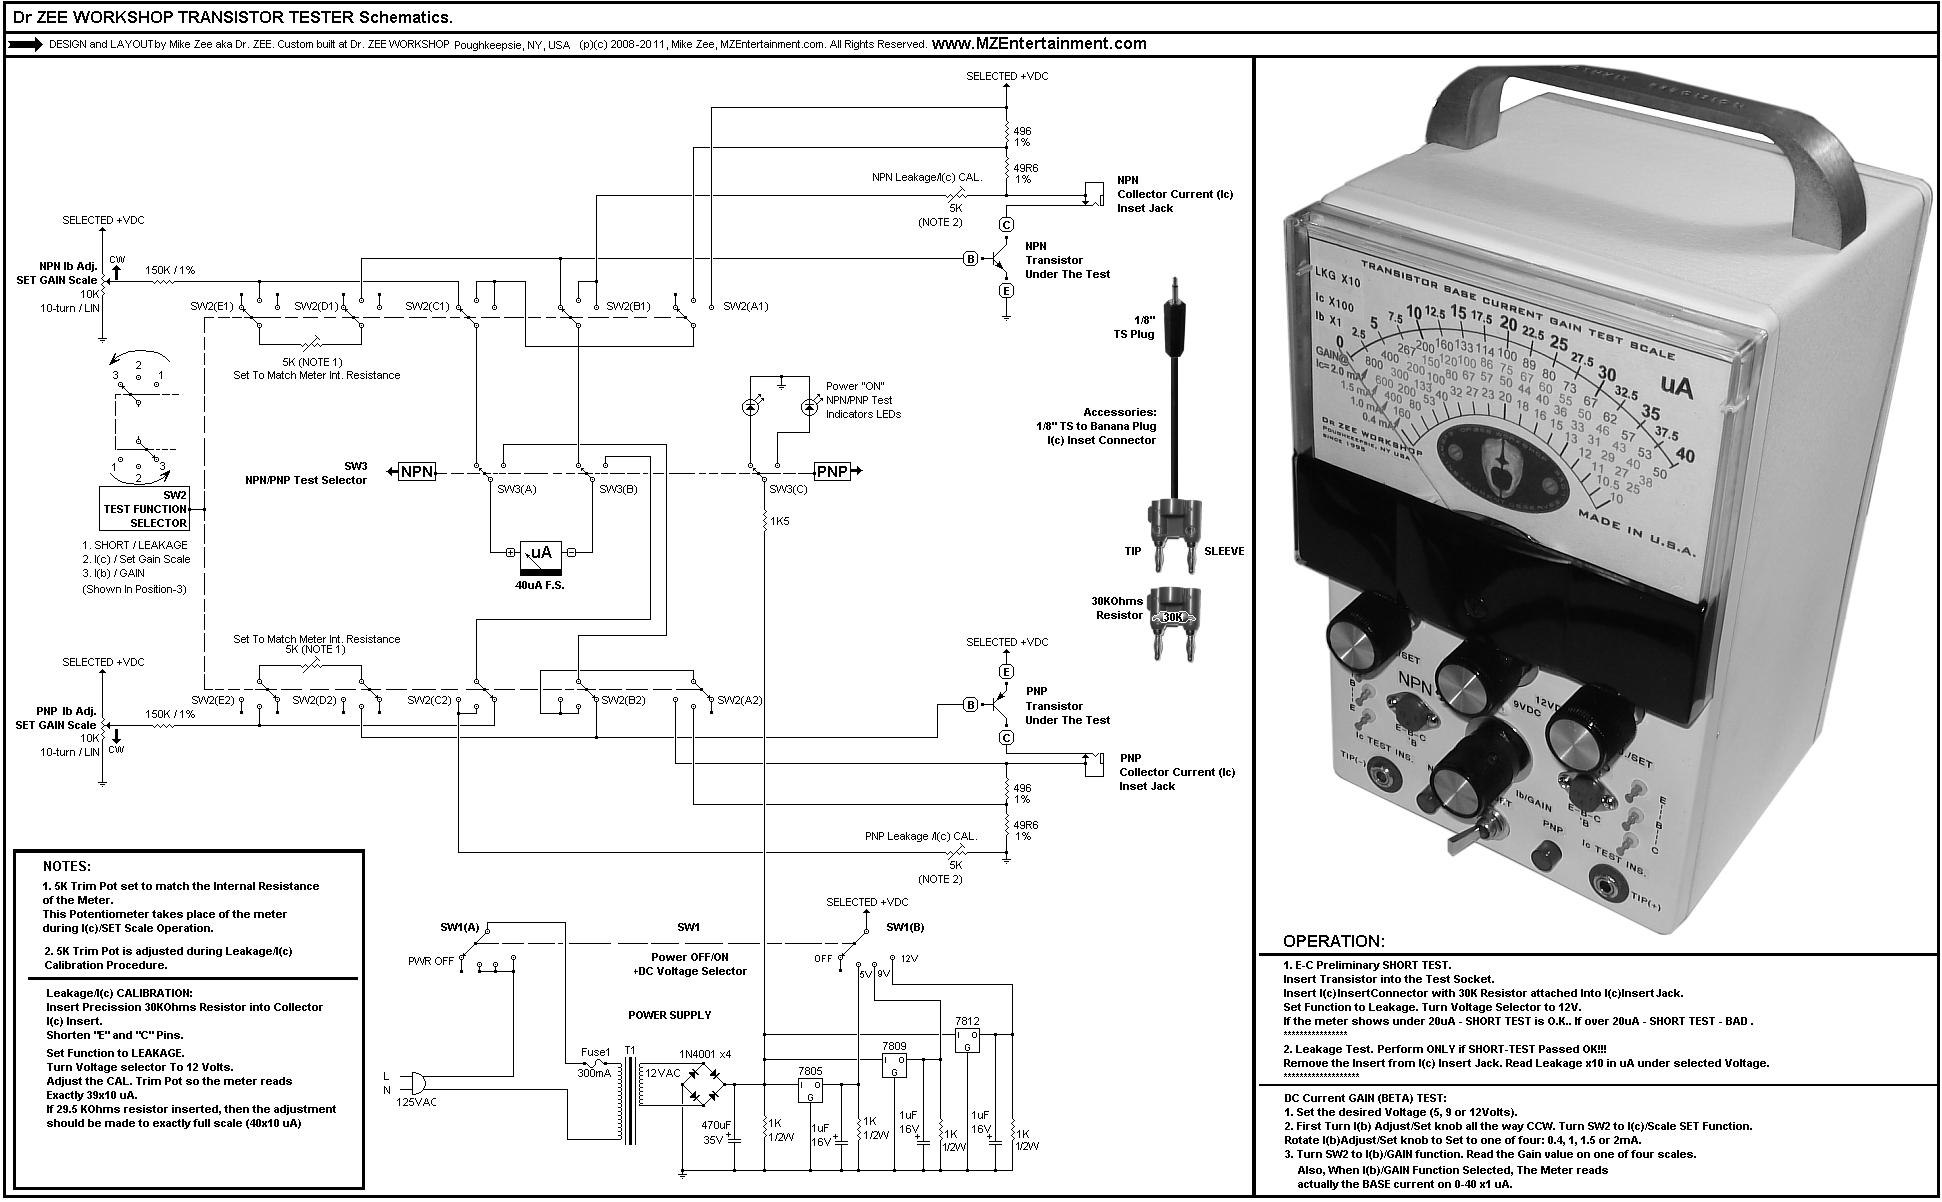 variac wiring diagram vmware view horizon visio free